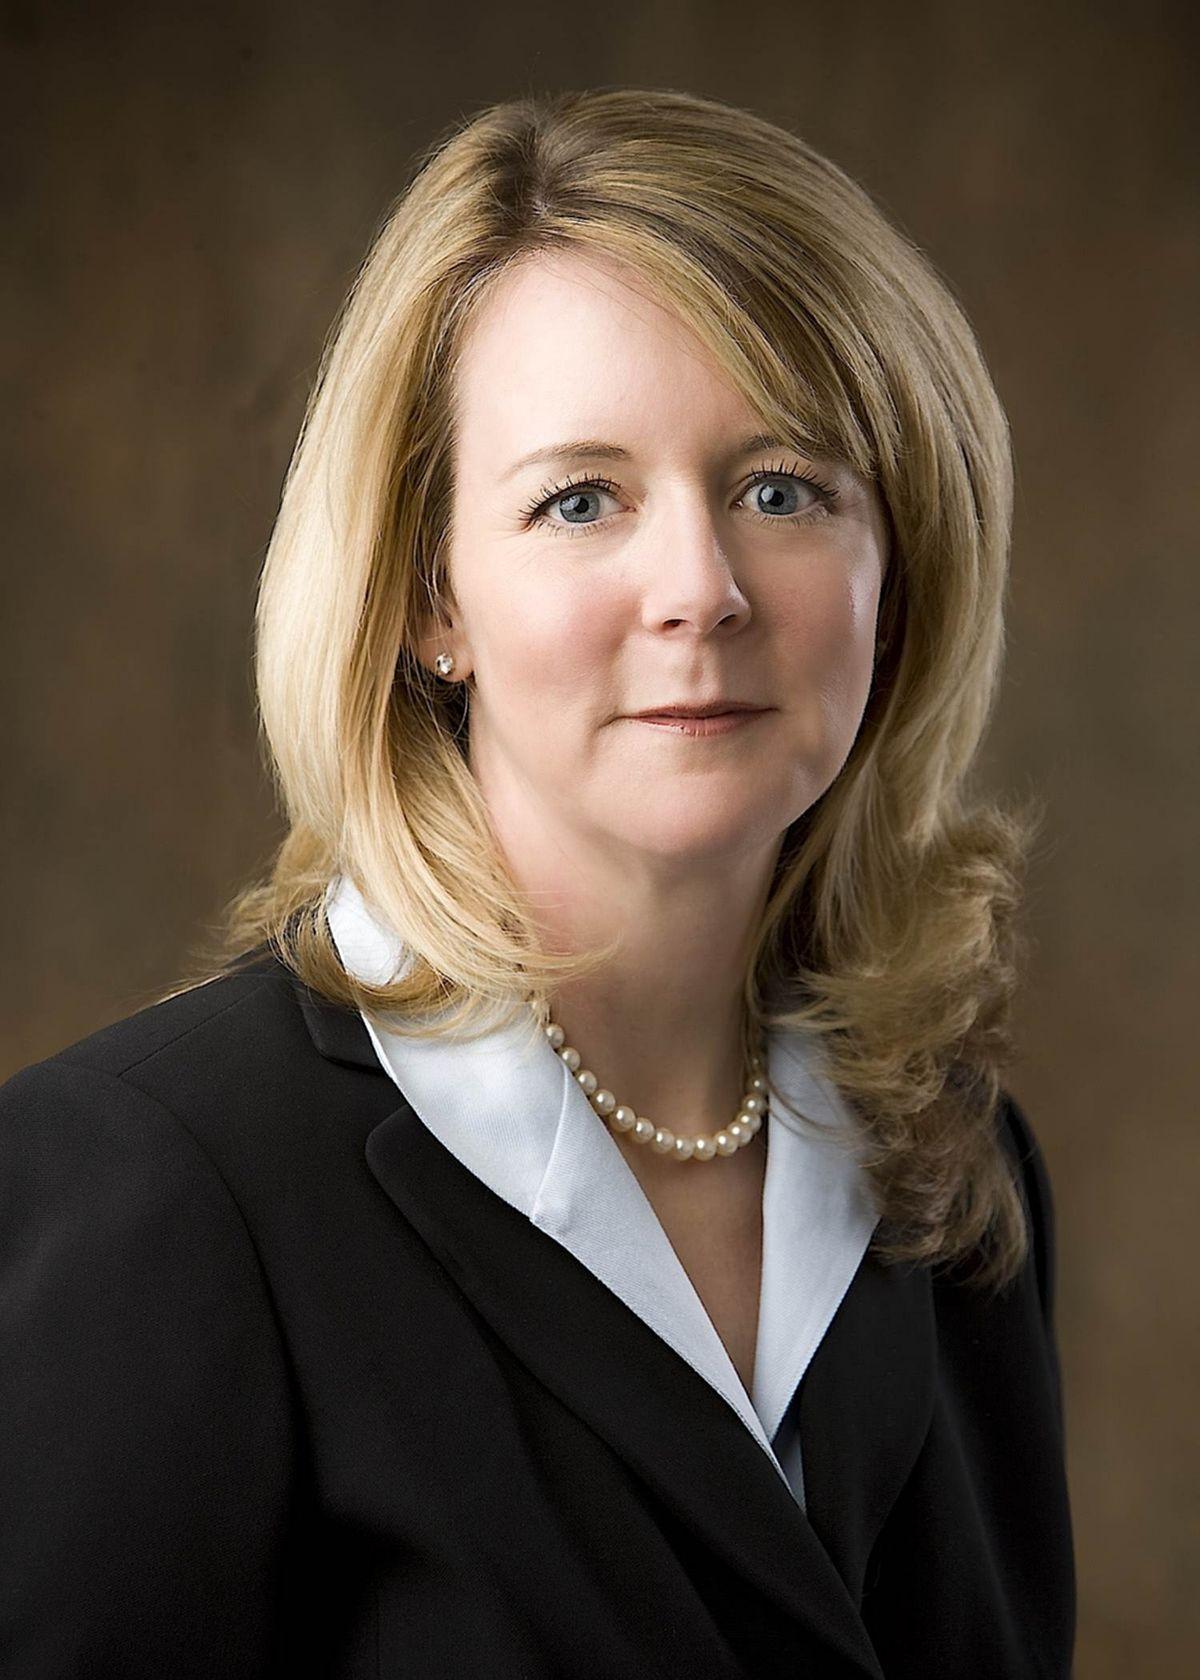 Emily Schulman